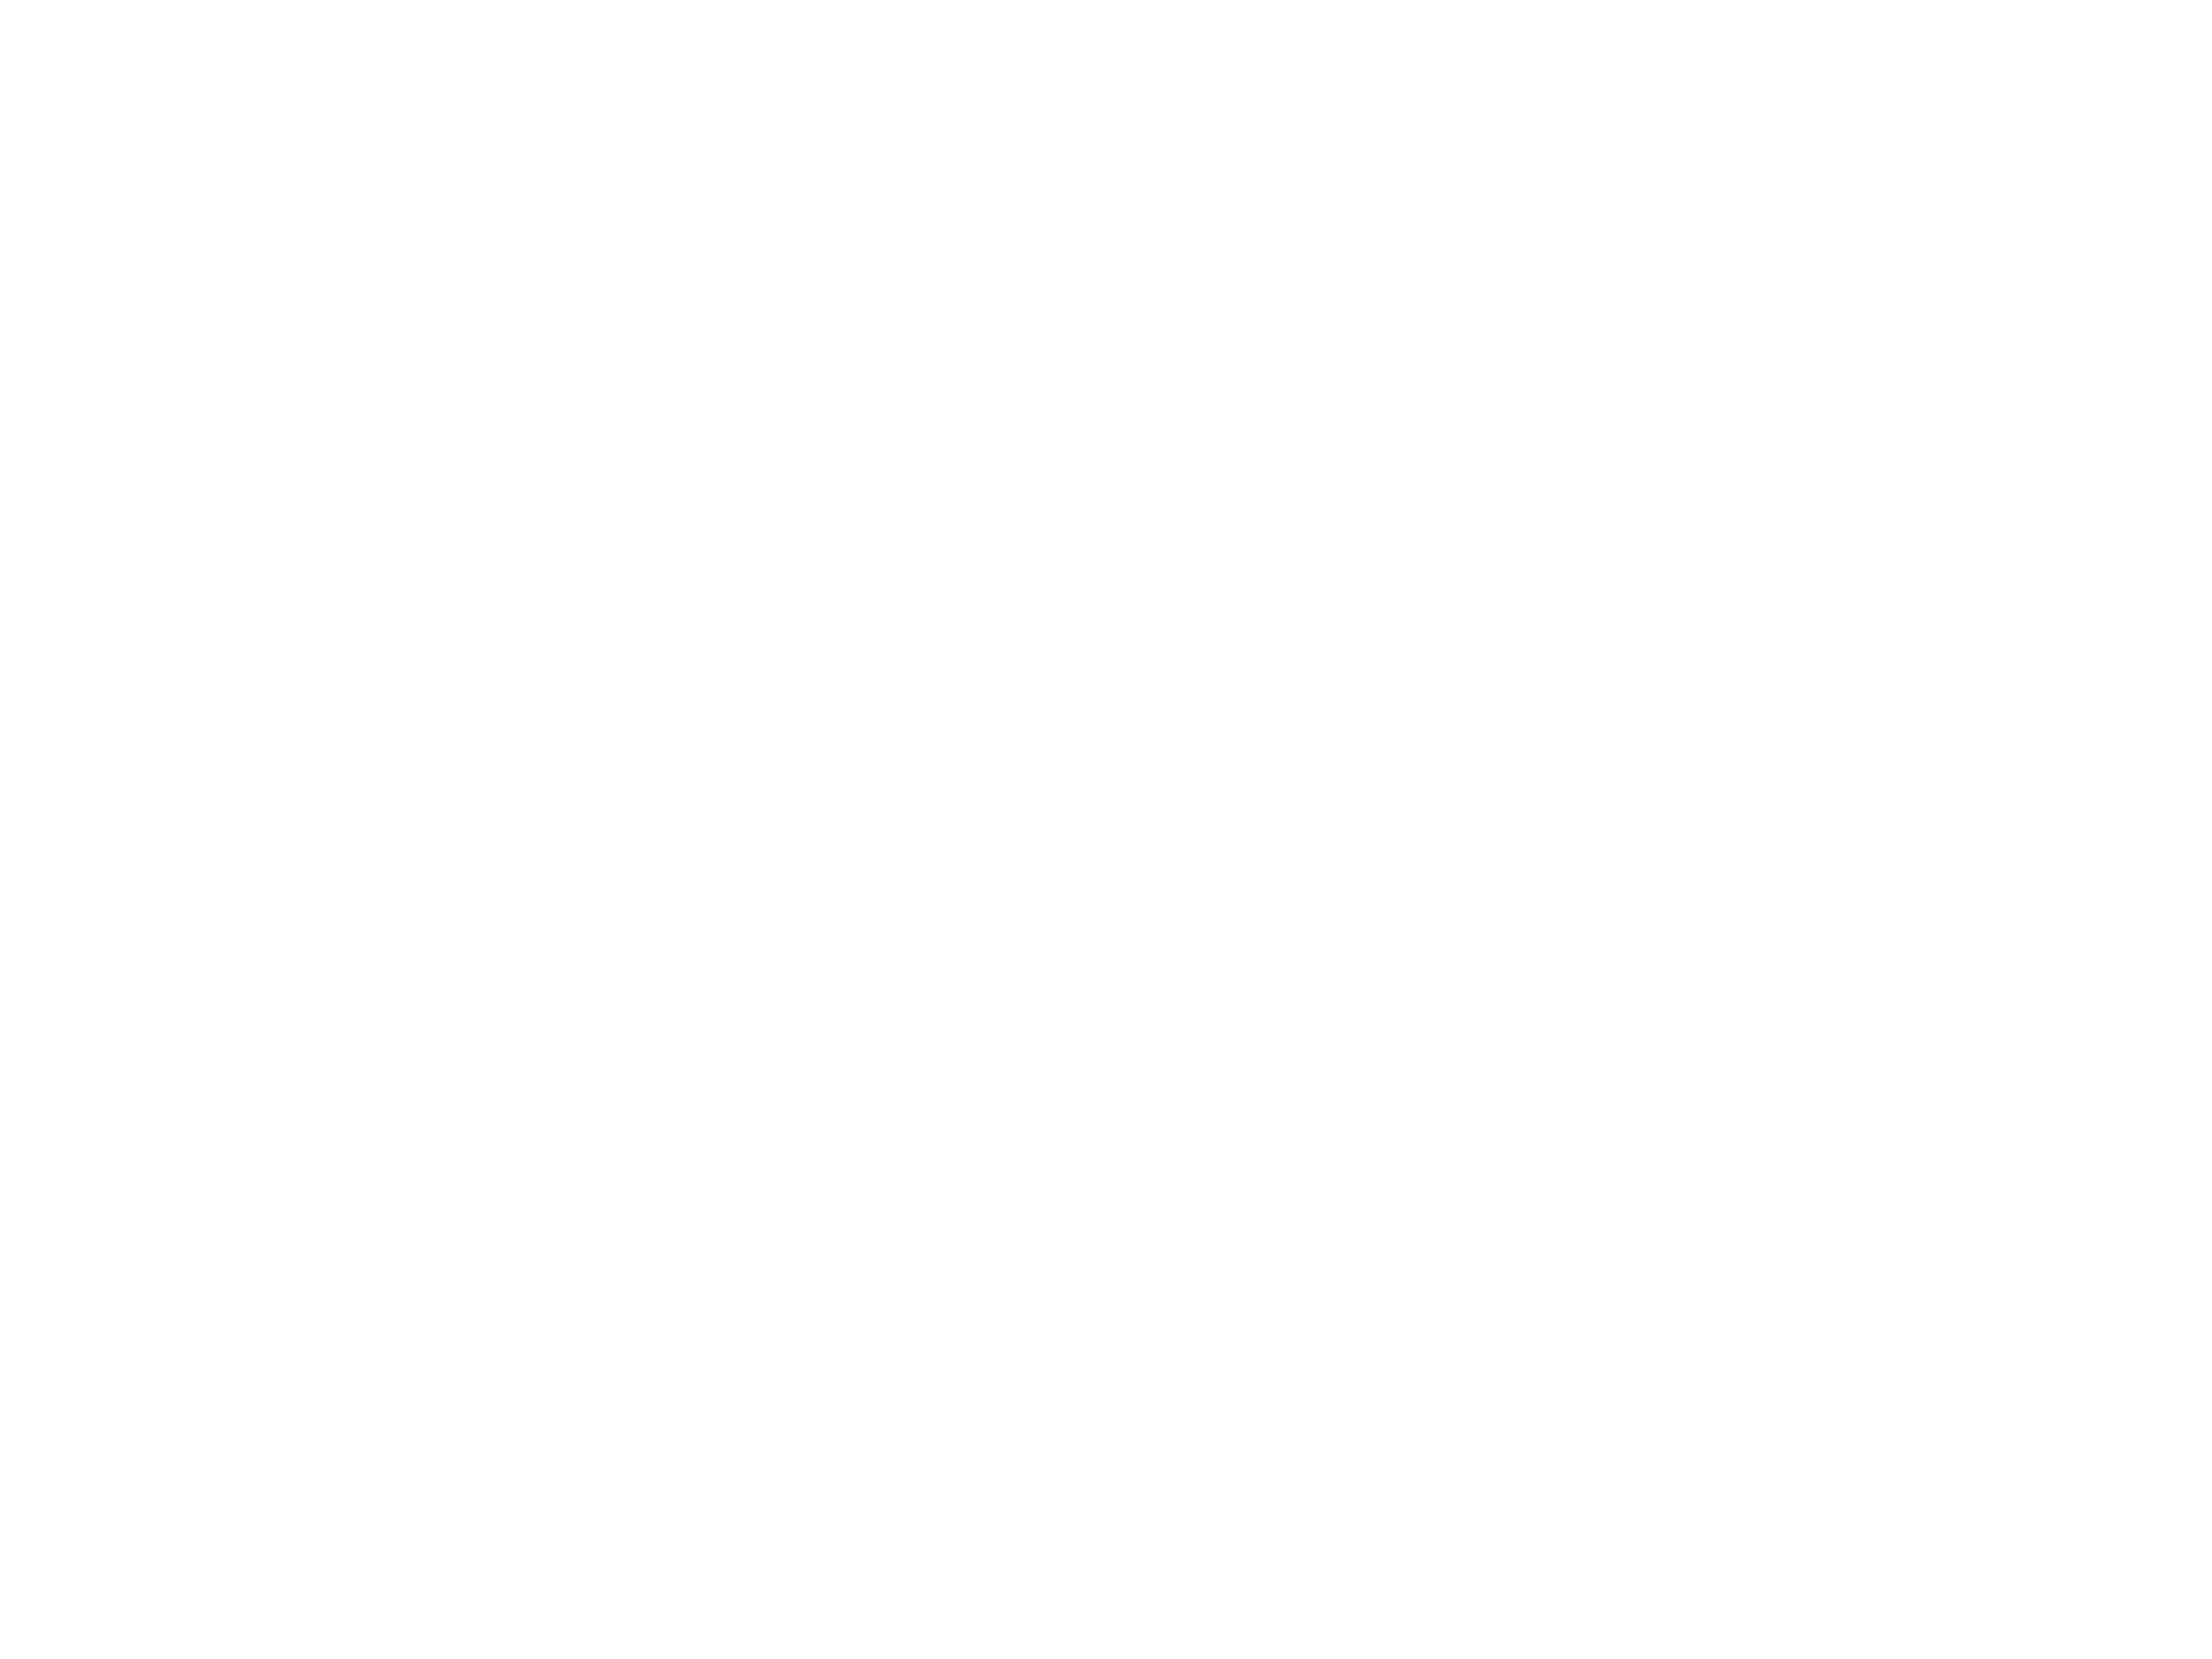 christio-pamungkas-1458392-unsplash